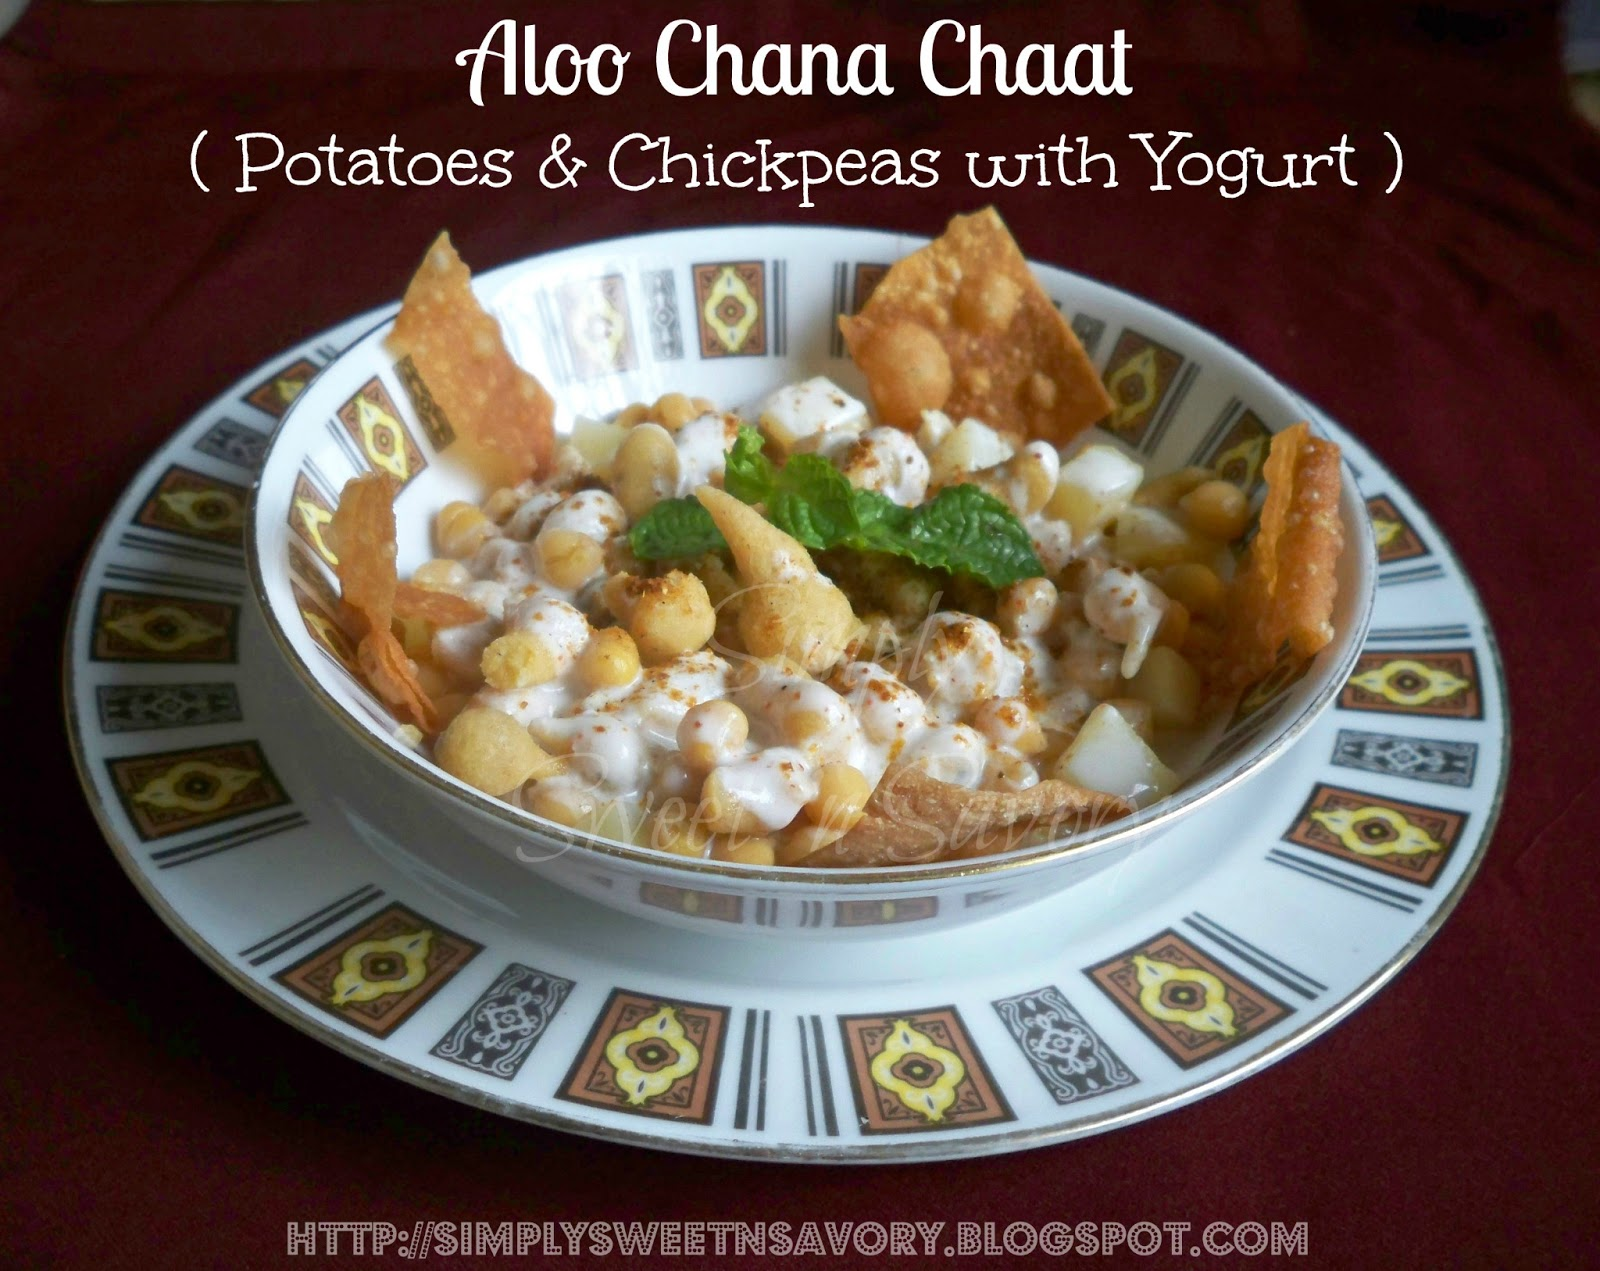 ... potatoes, boondi ( fried drops of gram-flour batter) with yogurt sauce